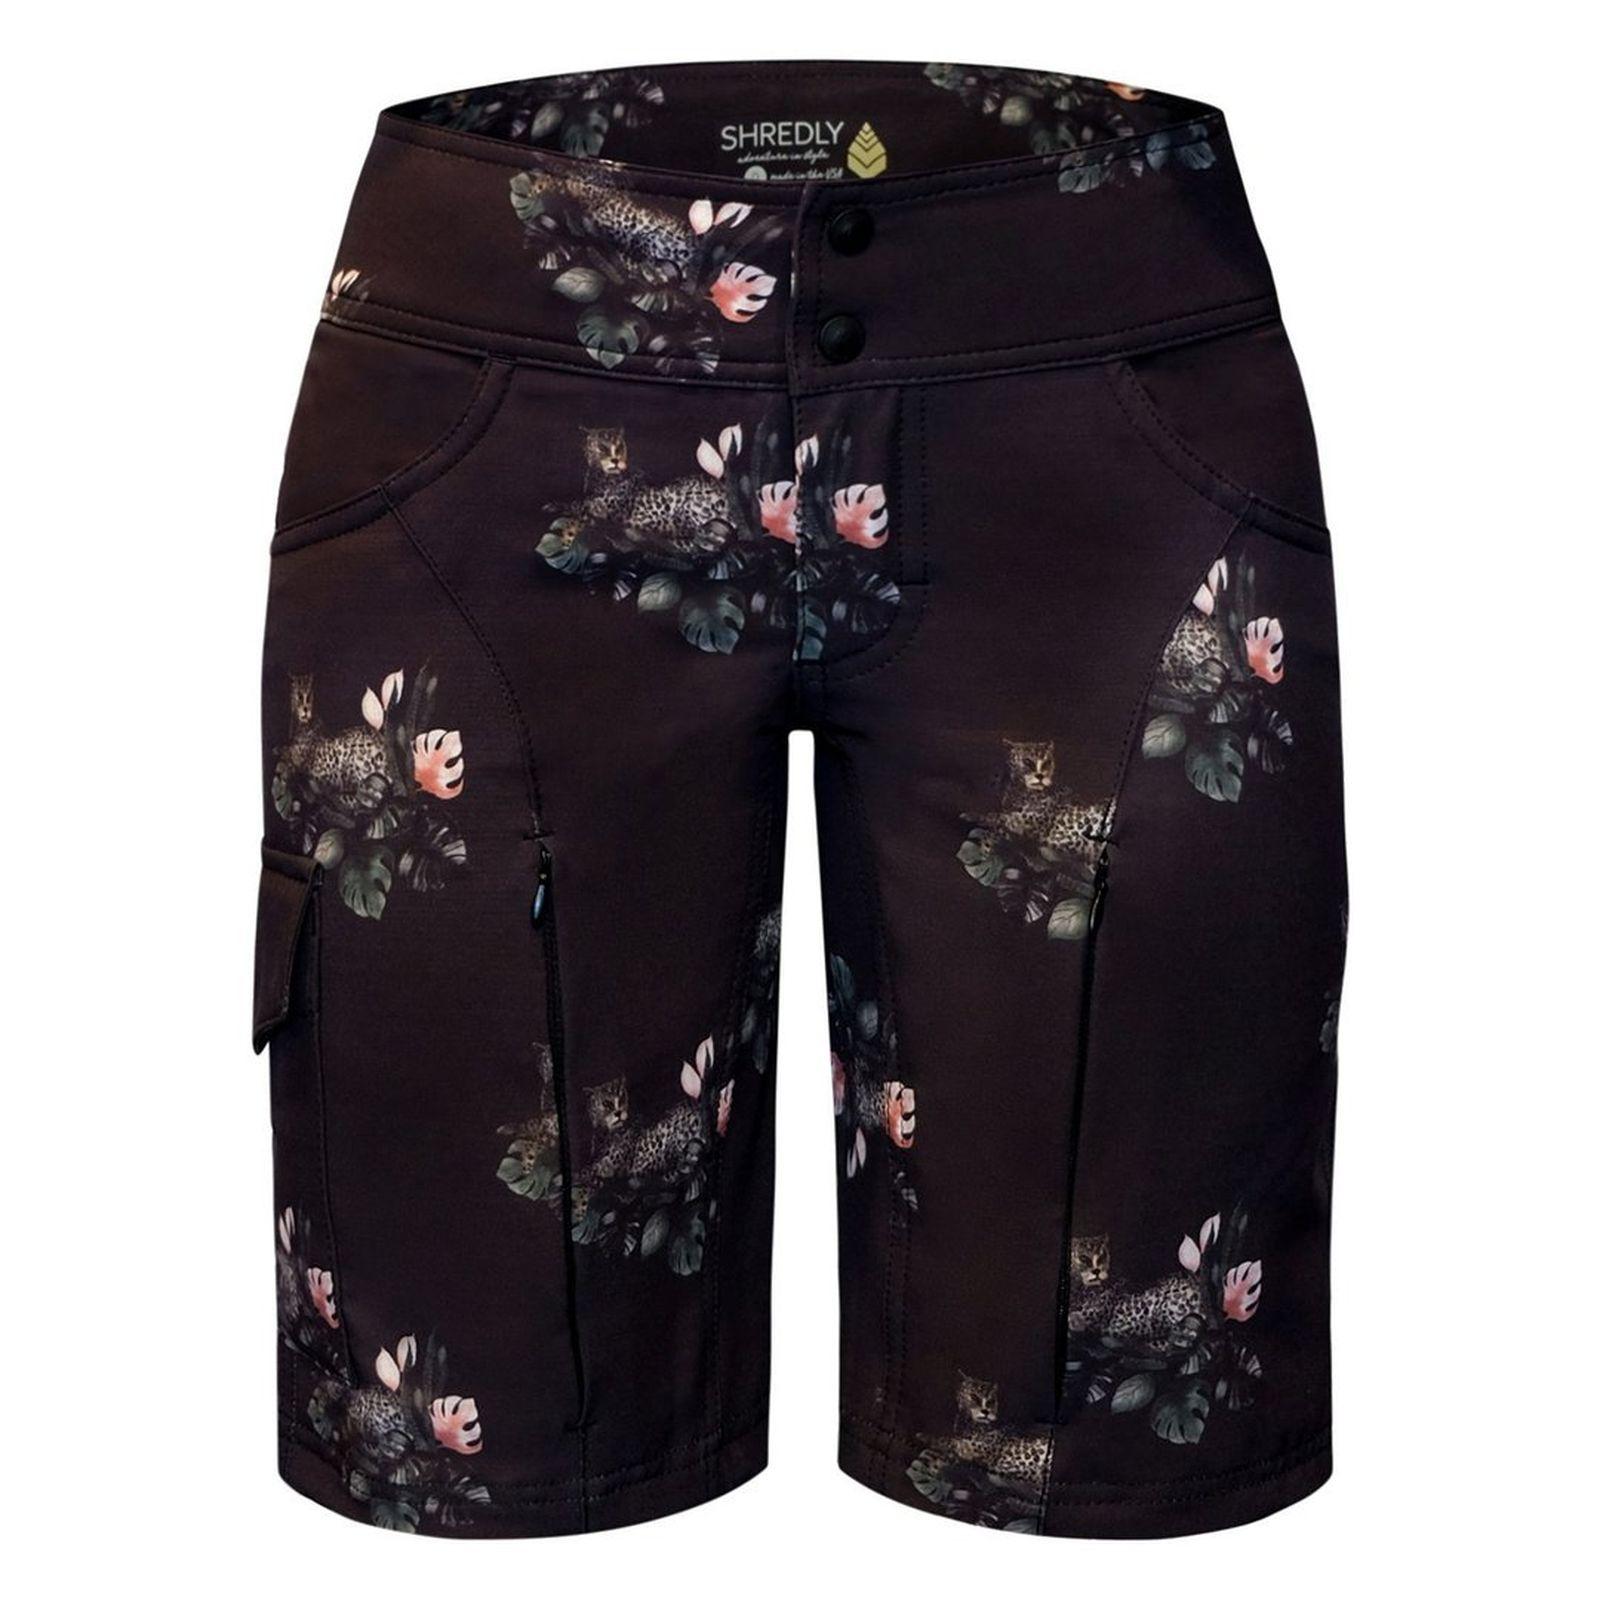 shredly-the-MTB-SHORT-SHANNA best womens cycling shorts